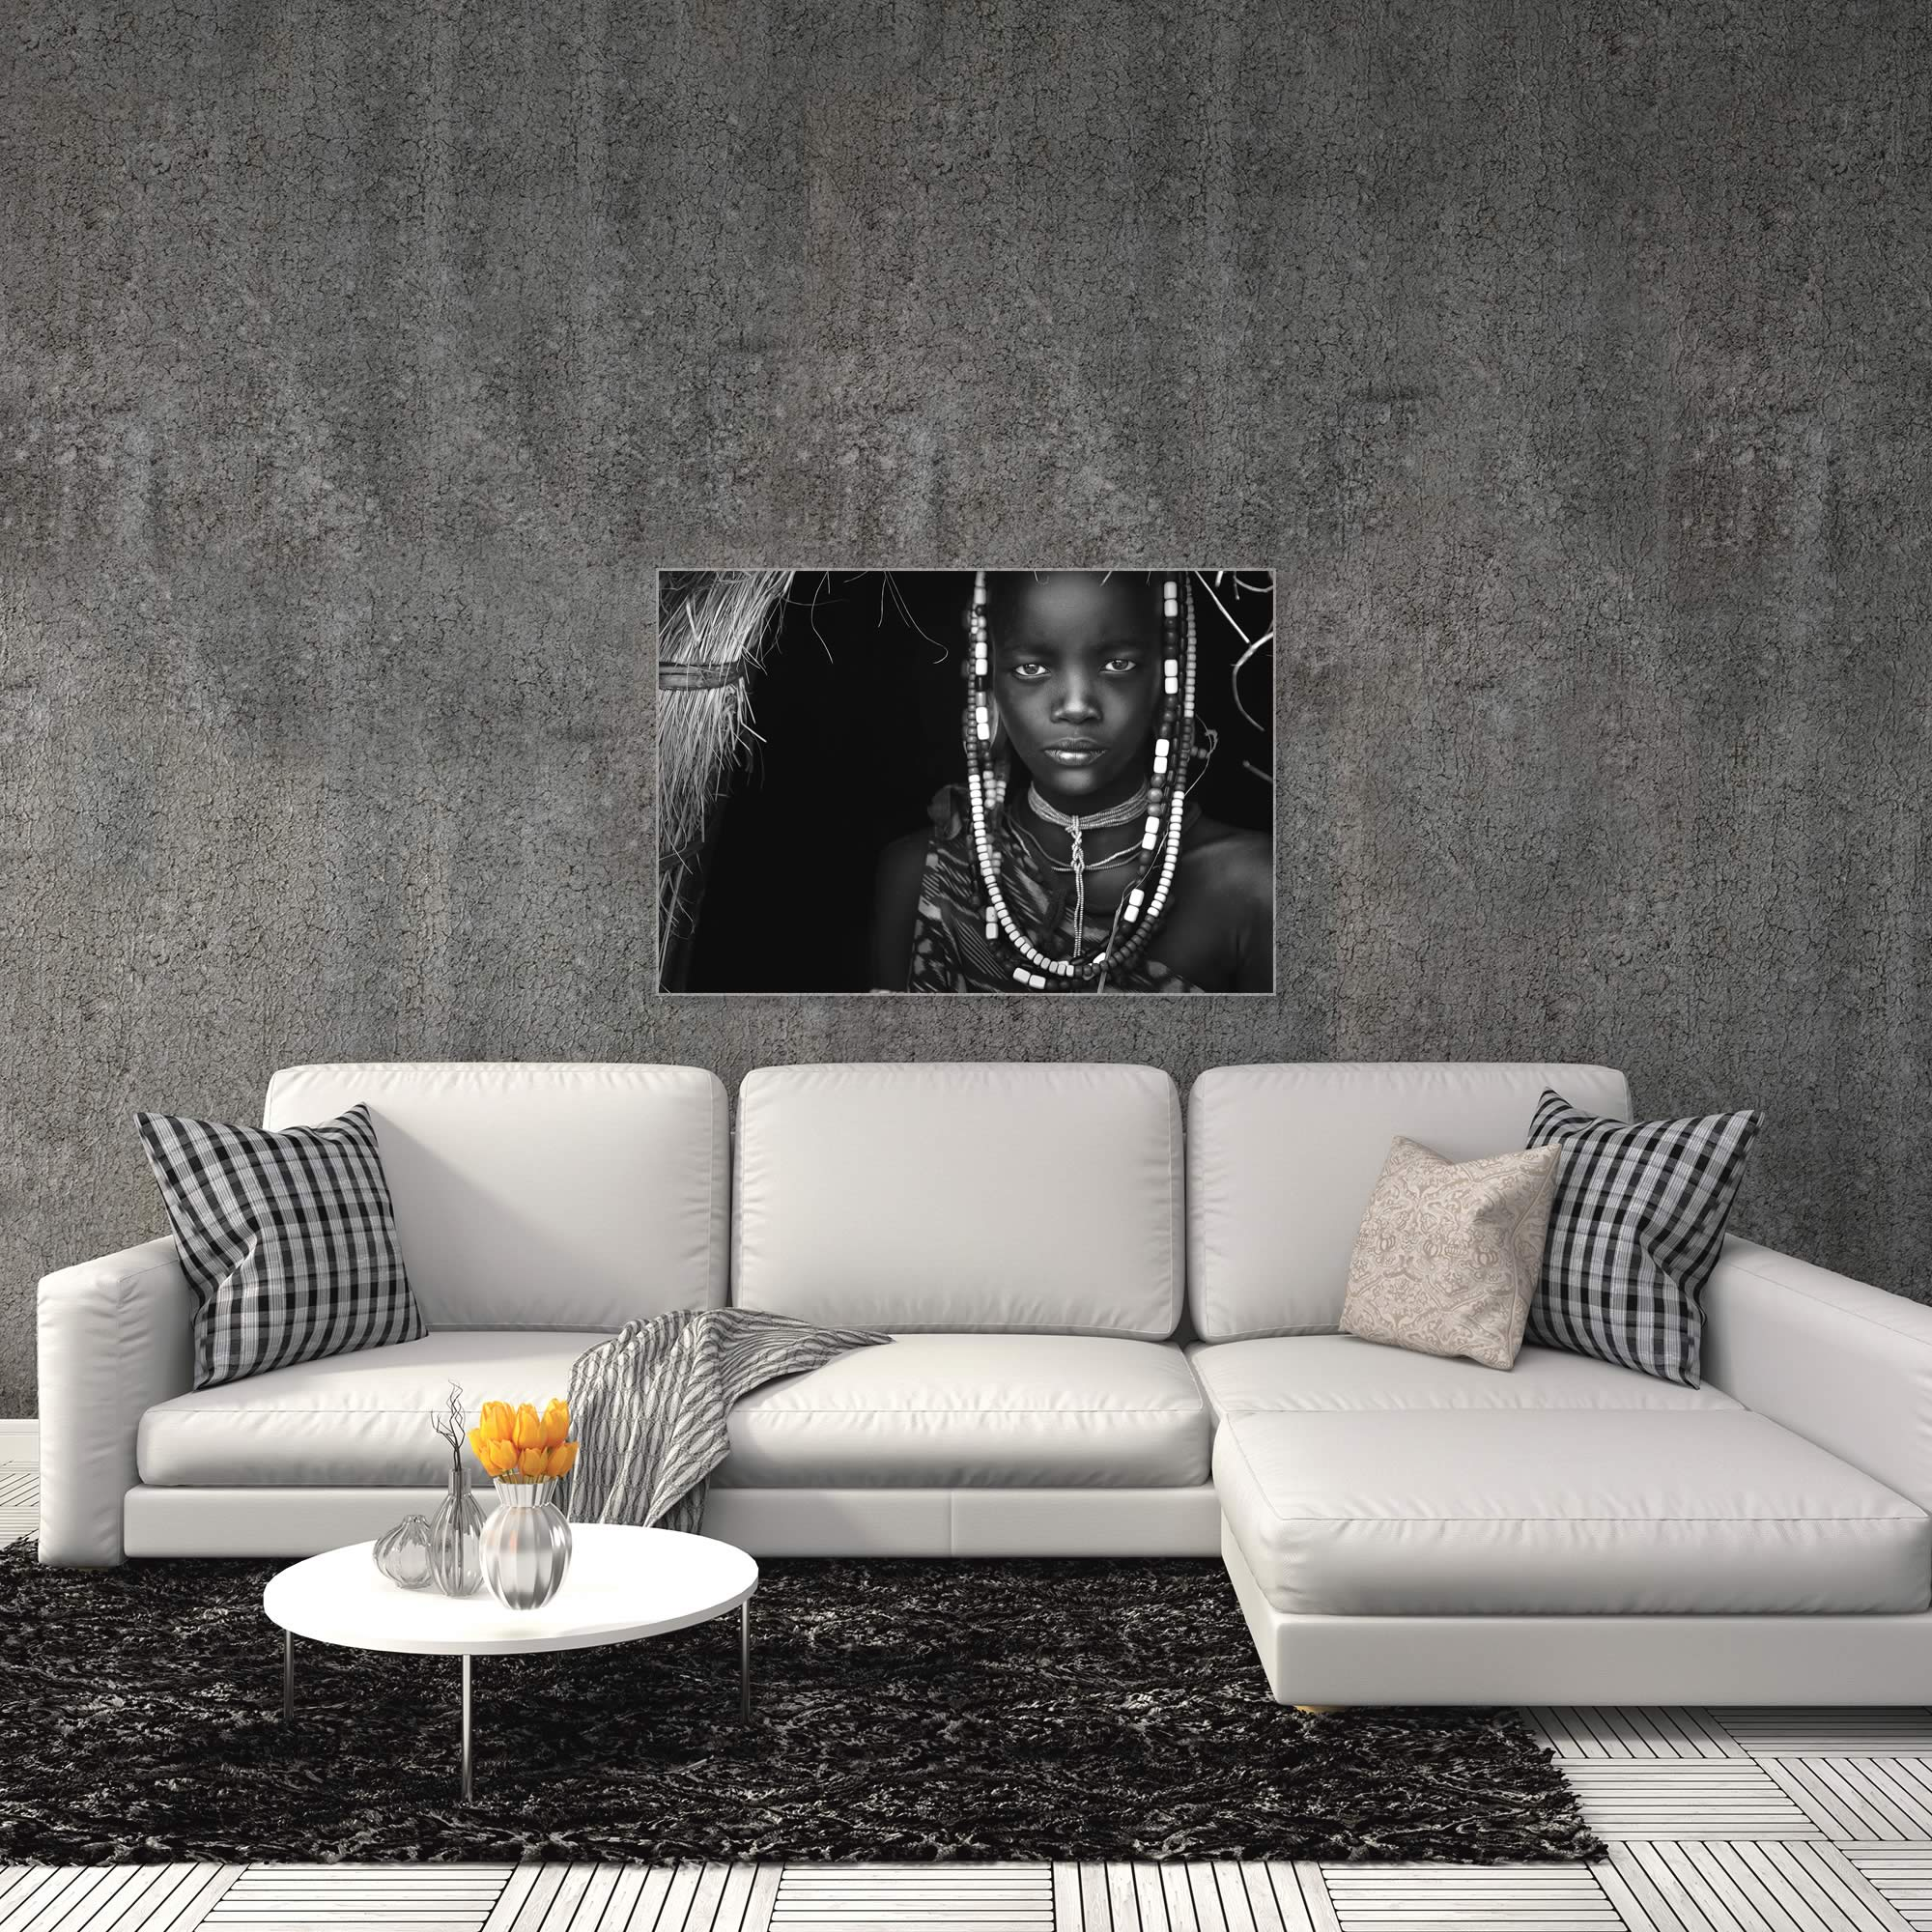 Mursi Girl by Hesham Alhumaid - African Fashion Art on Metal or Acrylic - Alternate View 3